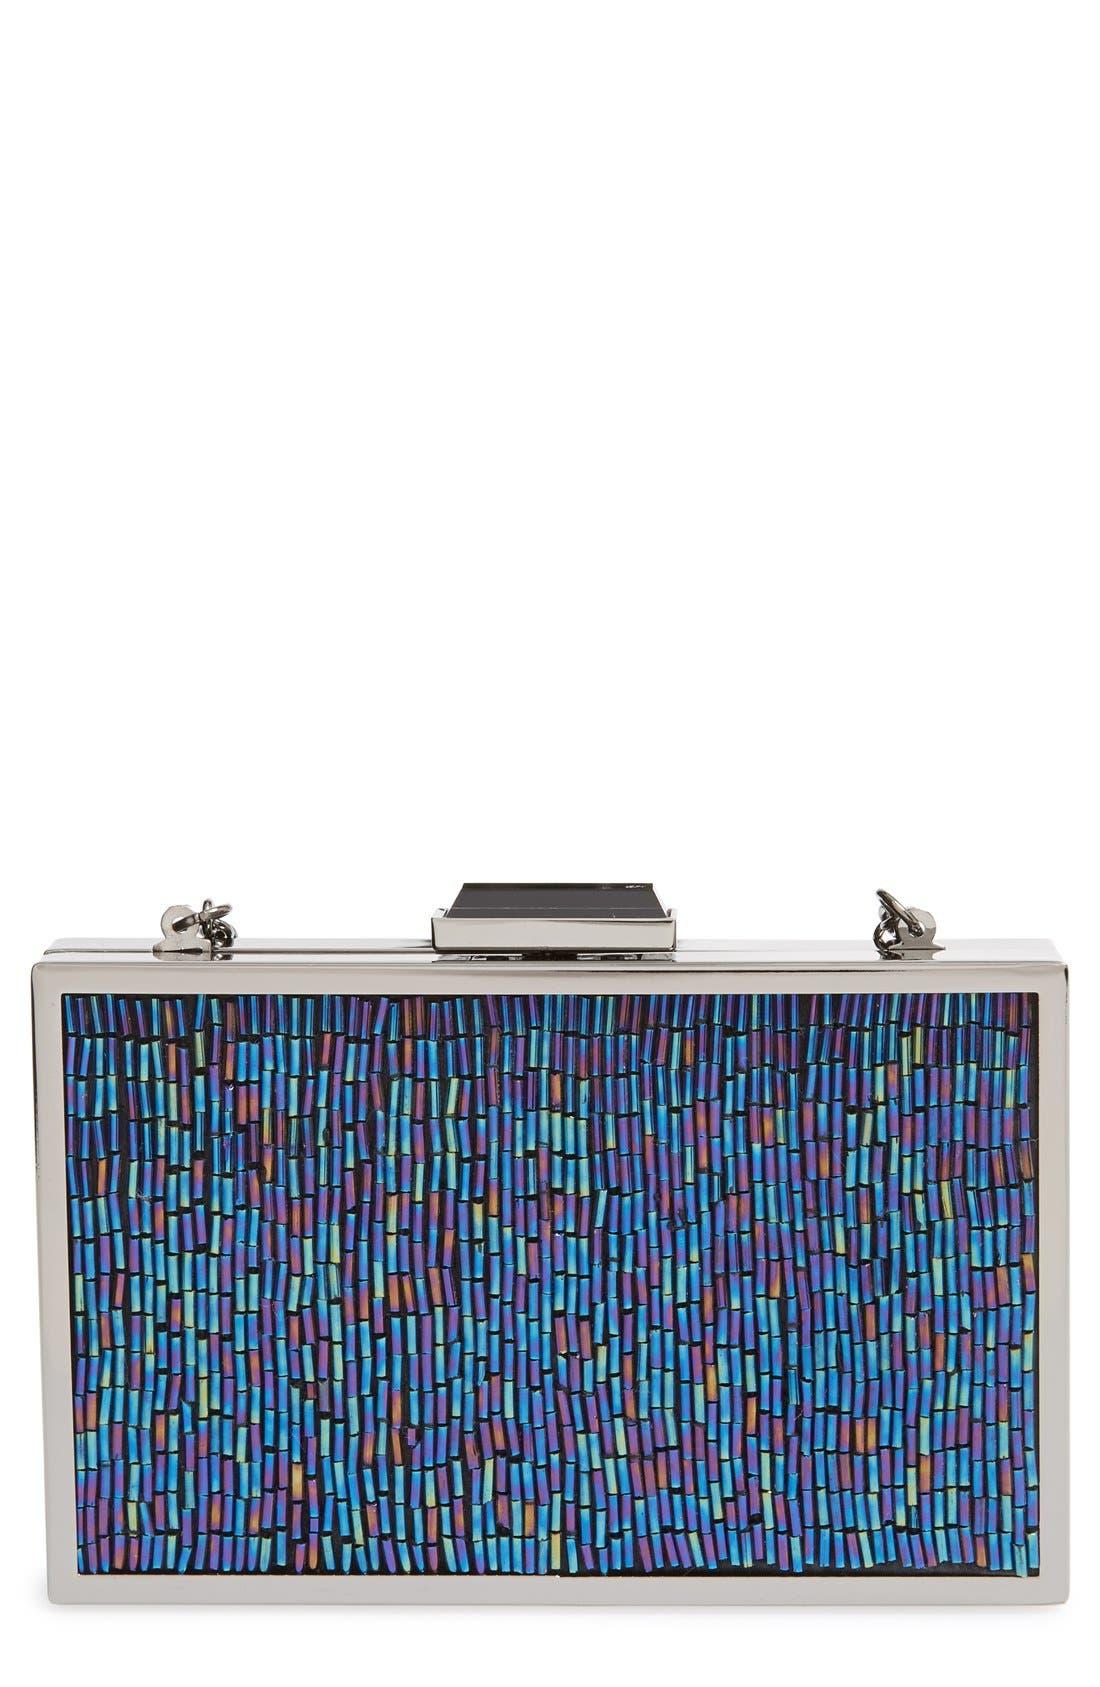 Alternate Image 1 Selected - Jessica McClintock 'Oilspill' Beaded Box Clutch